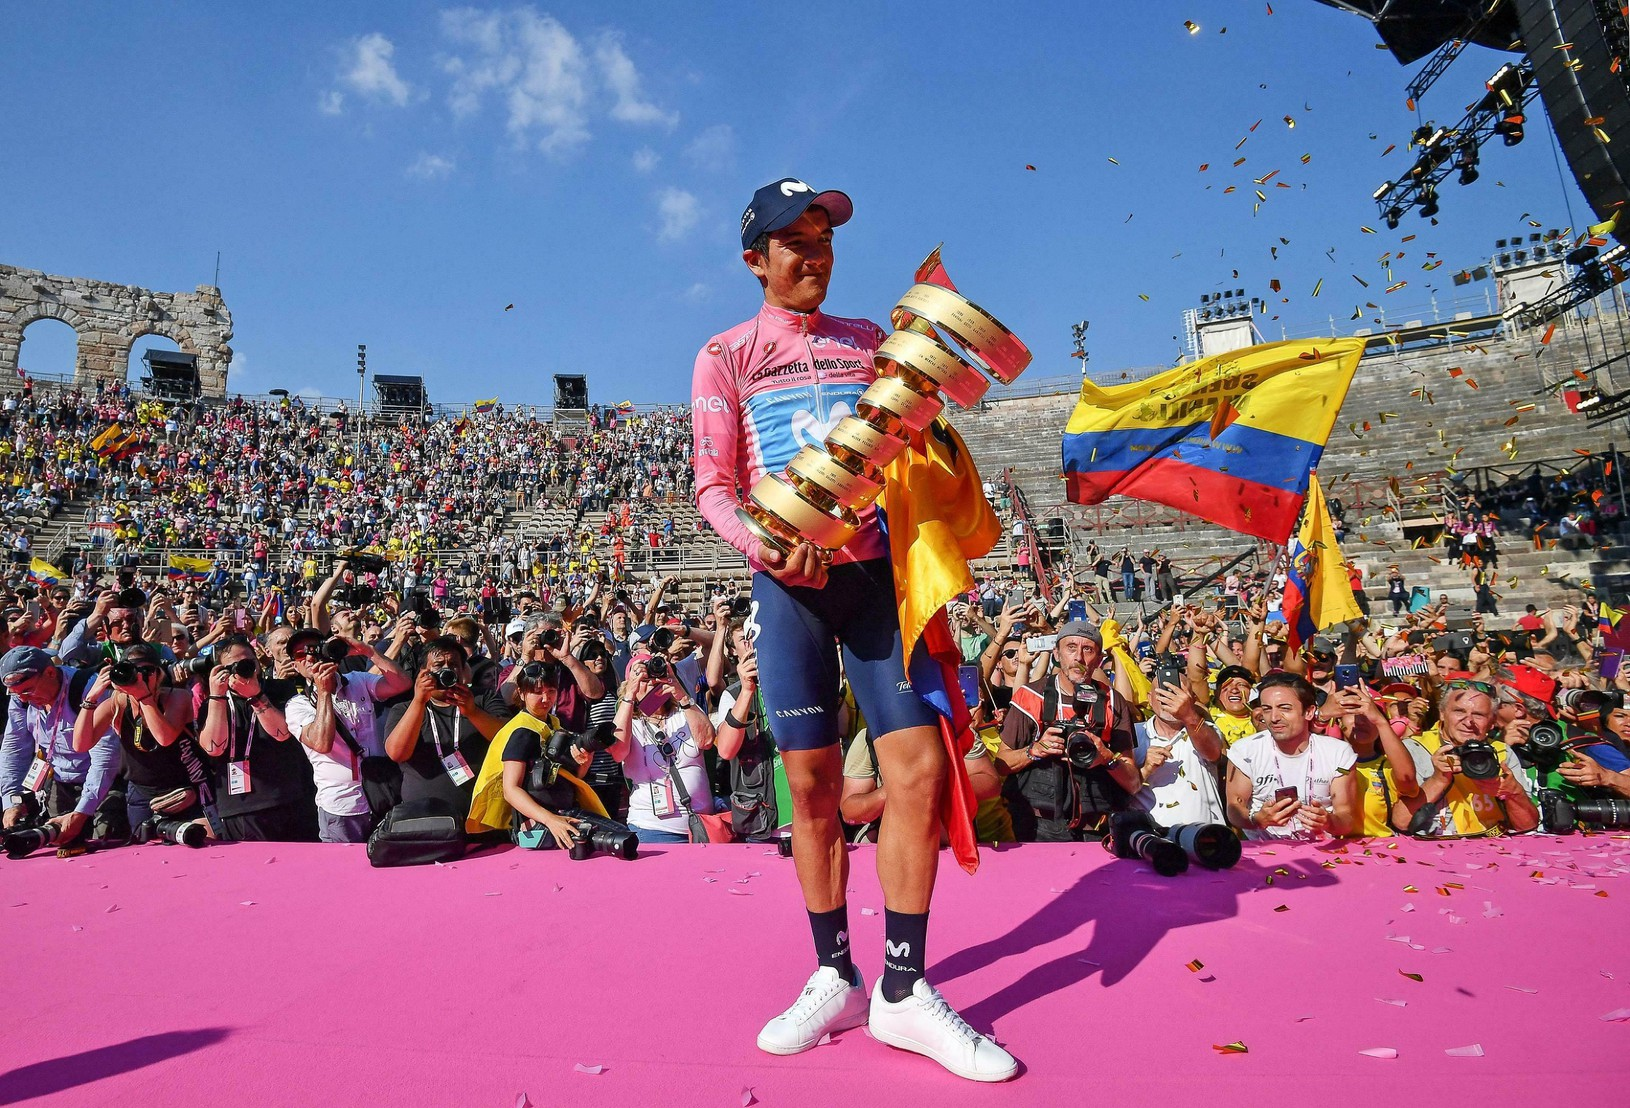 Ekvádorský cyklista Richard Carapaz